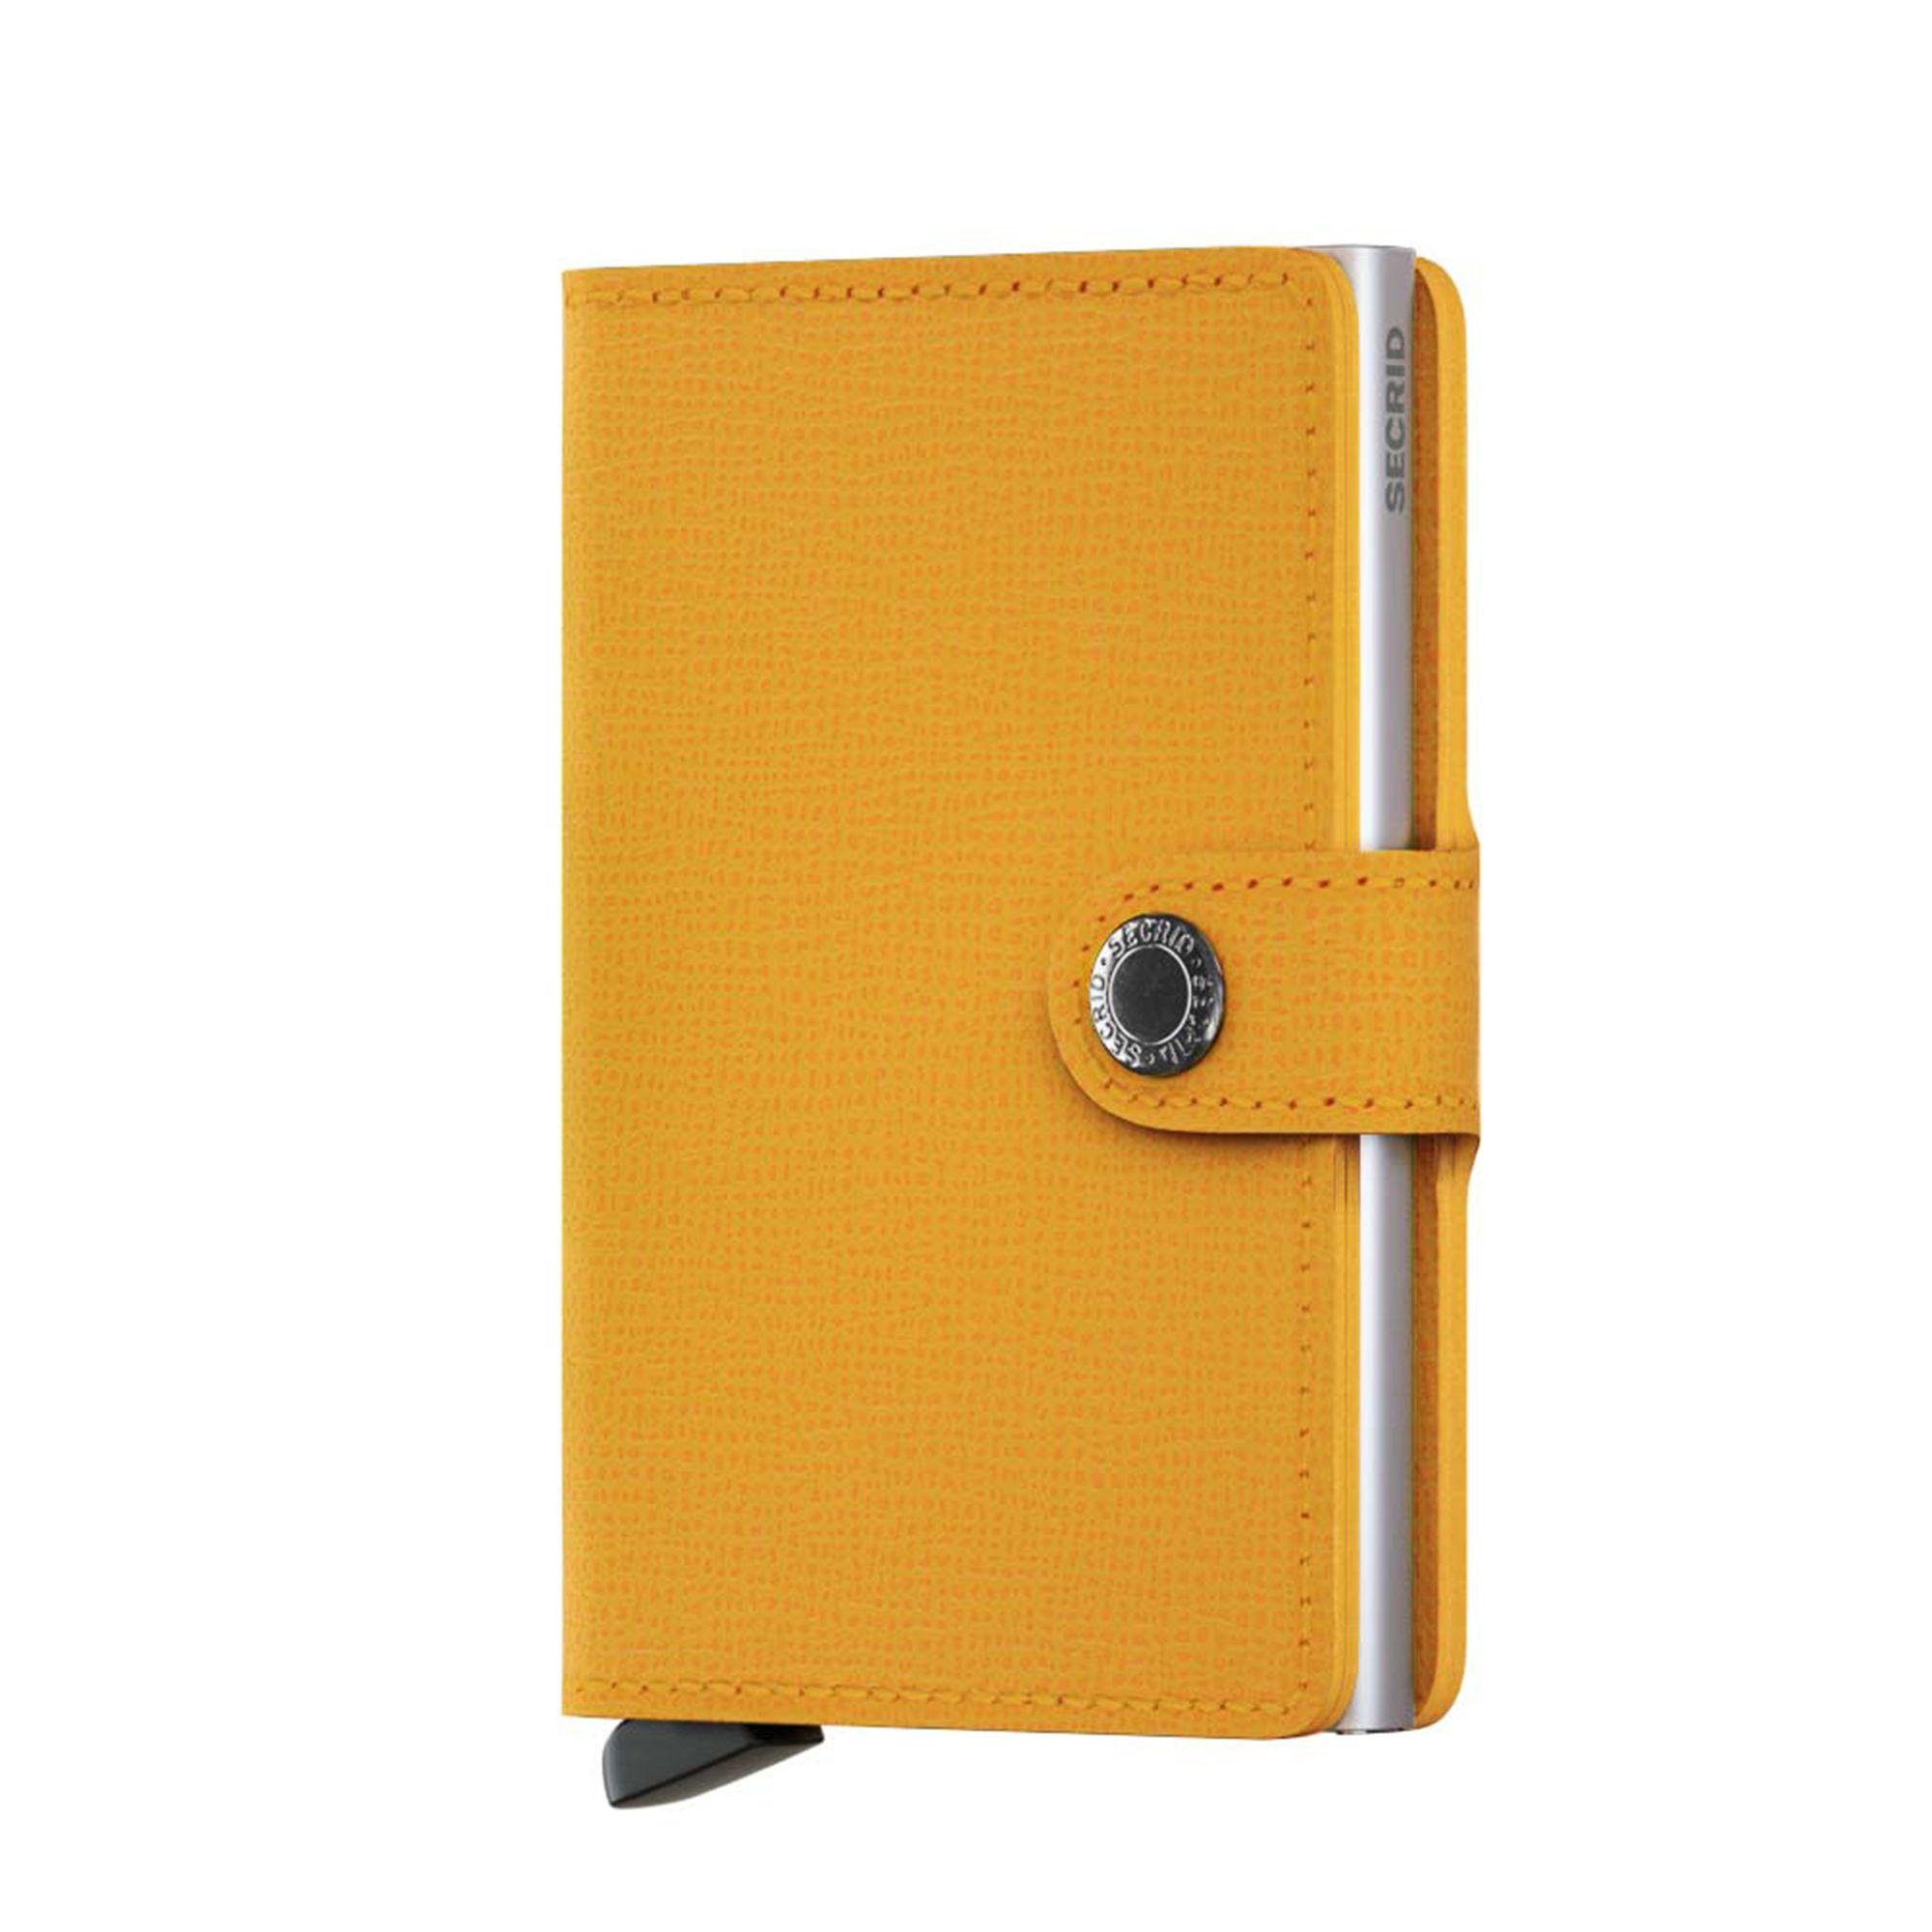 Secrid Miniwallet liten plånbok, Mörkgul